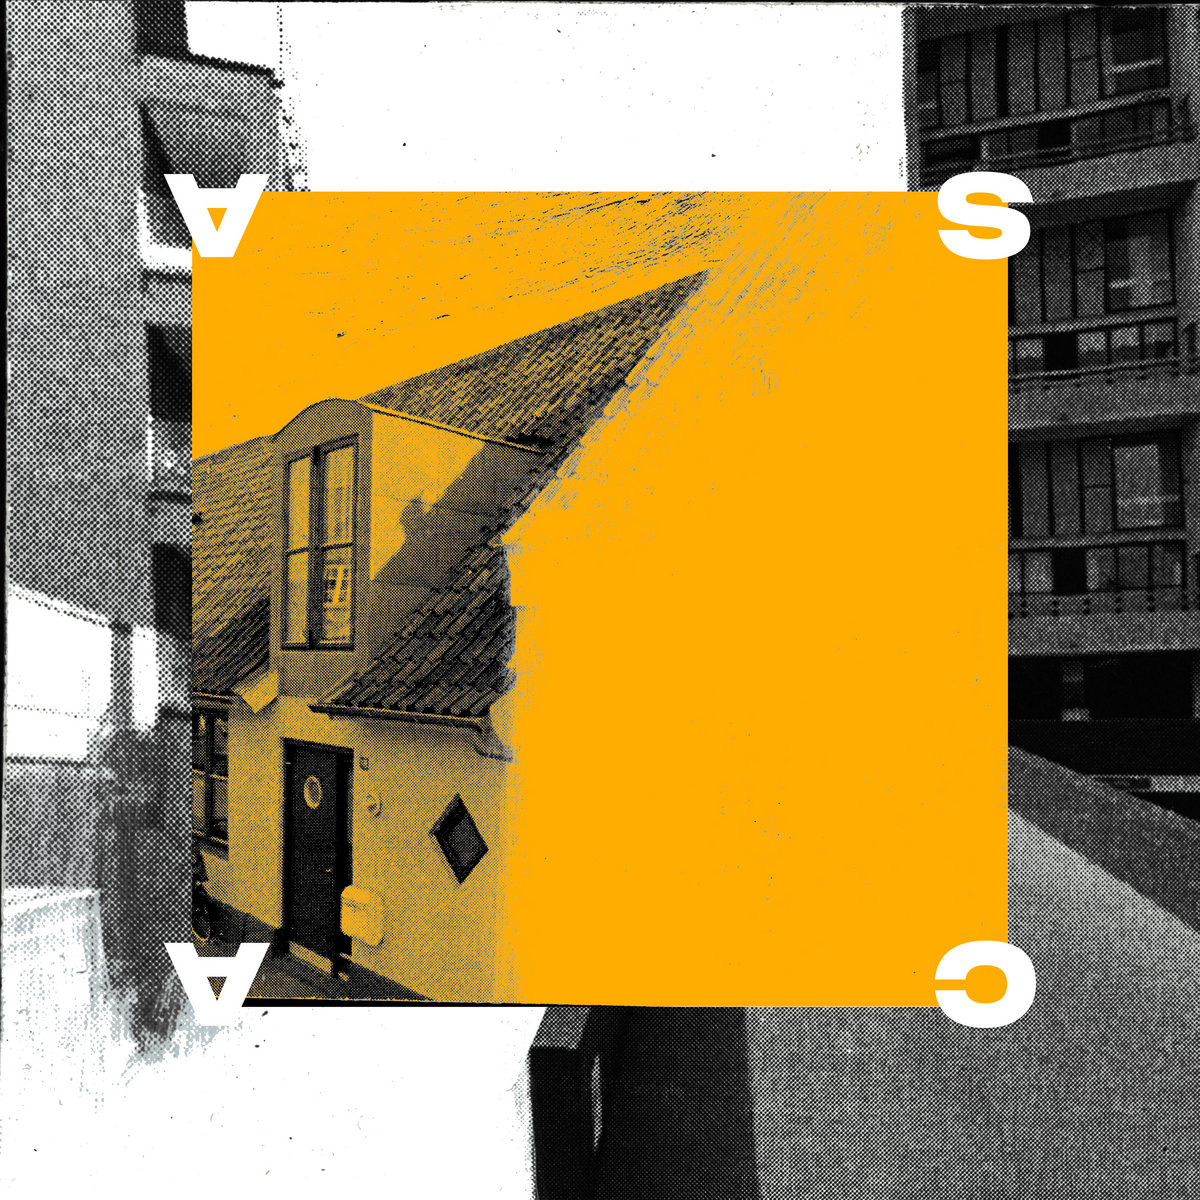 New Finds / No Words: Grap Luva, Kidkanevil, Pseudo Intellectuals, Kid Sublime, Pan Amsterdam, Tiago Frúgoli Ensemble, Aver & more